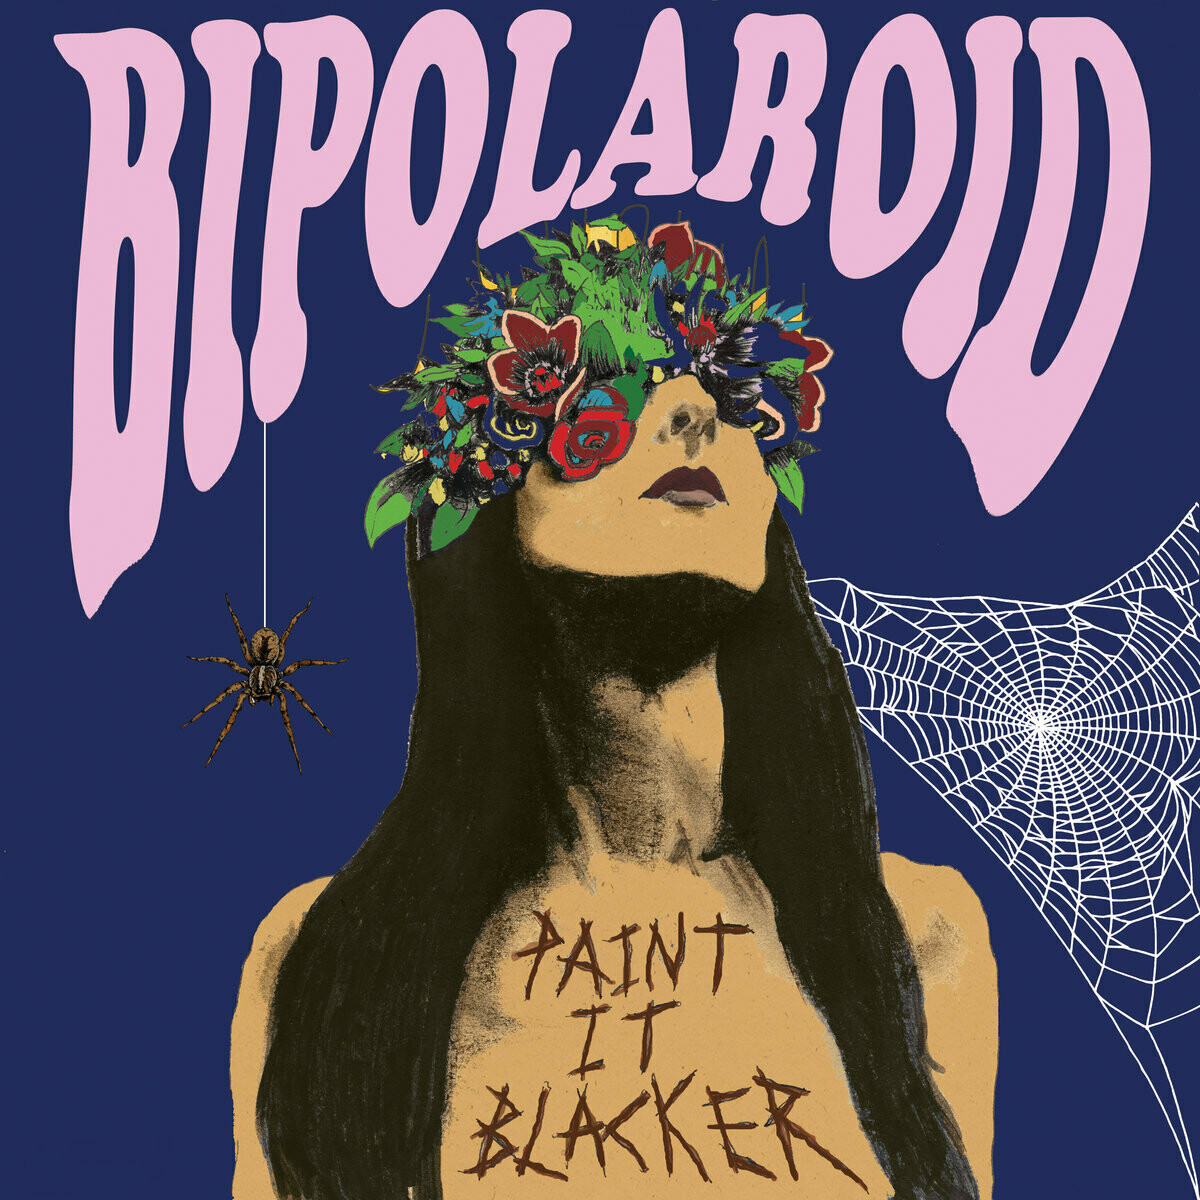 Bipolaroid - Paint It Blacker LP - PreOrder